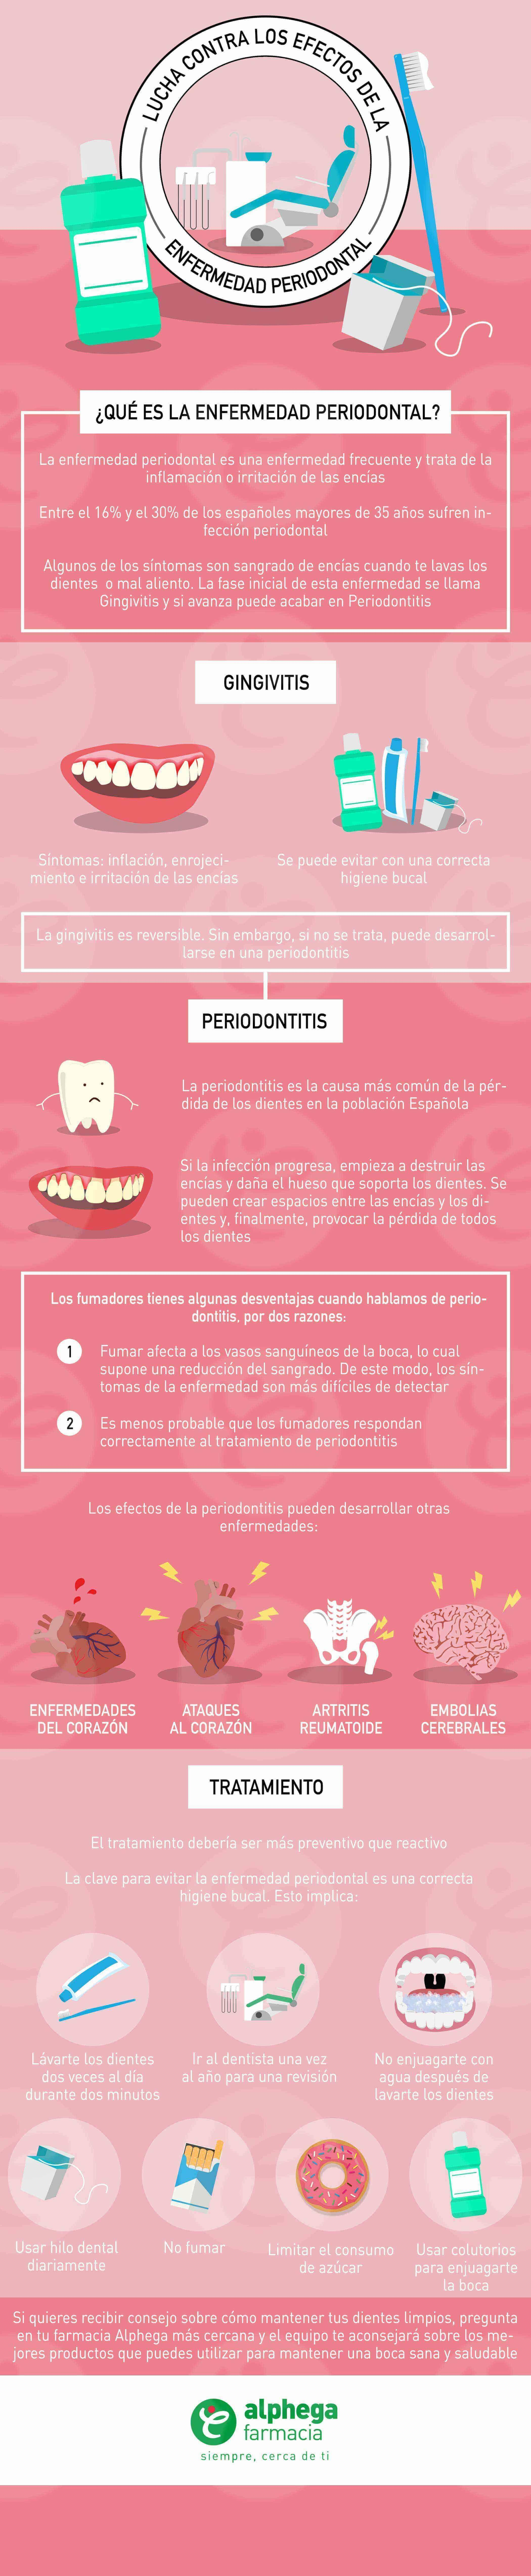 nfermedad periodontal infografia